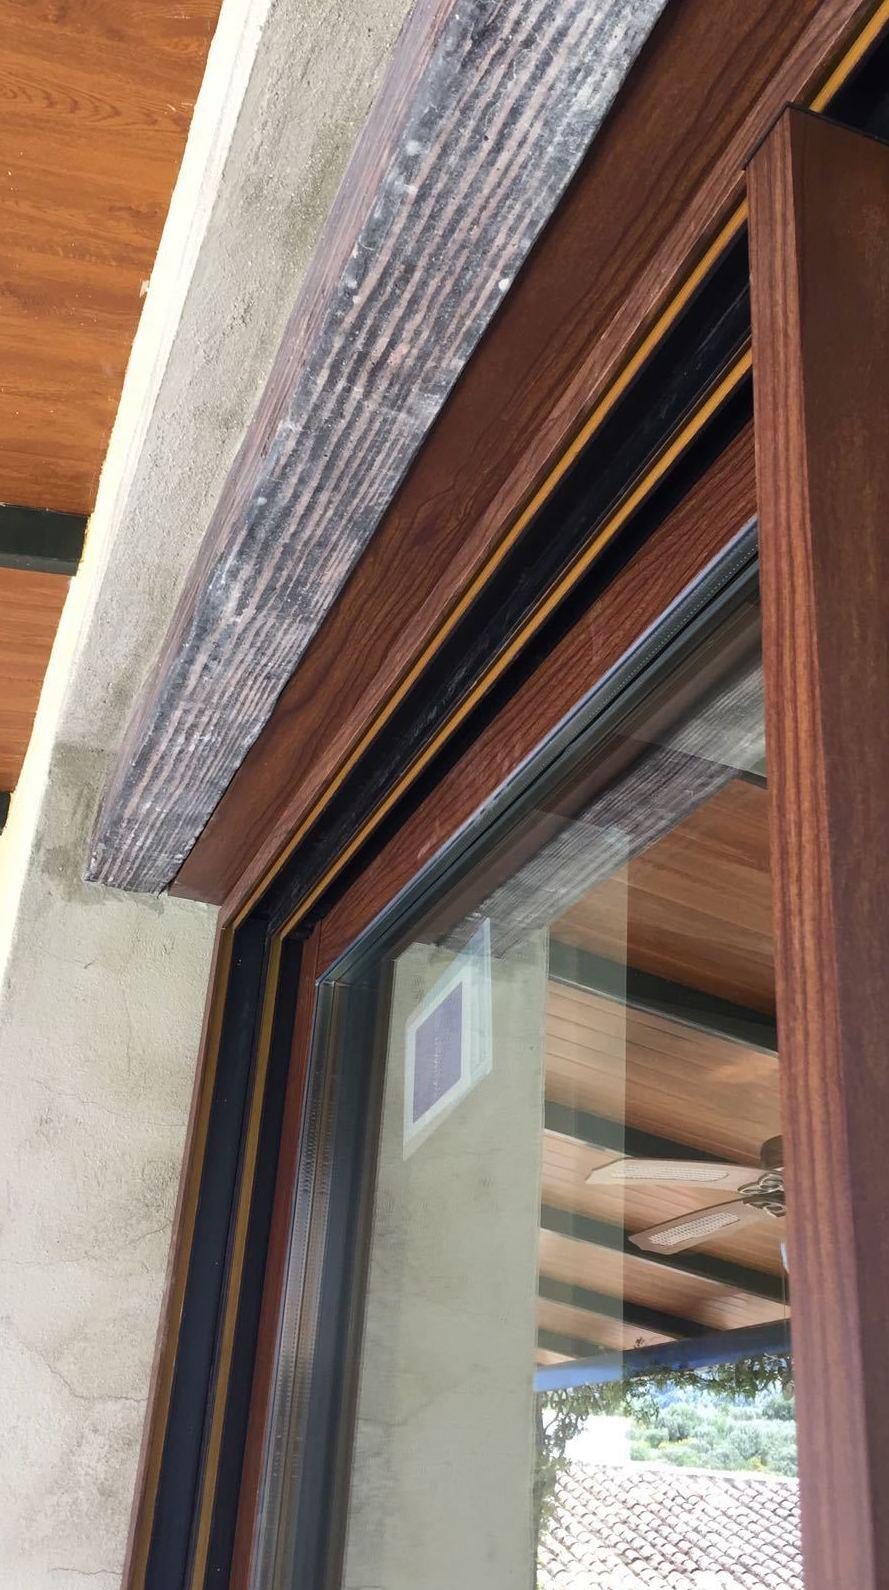 Foto 6 de Ventanas de aluminio en Albolote | Ekonal